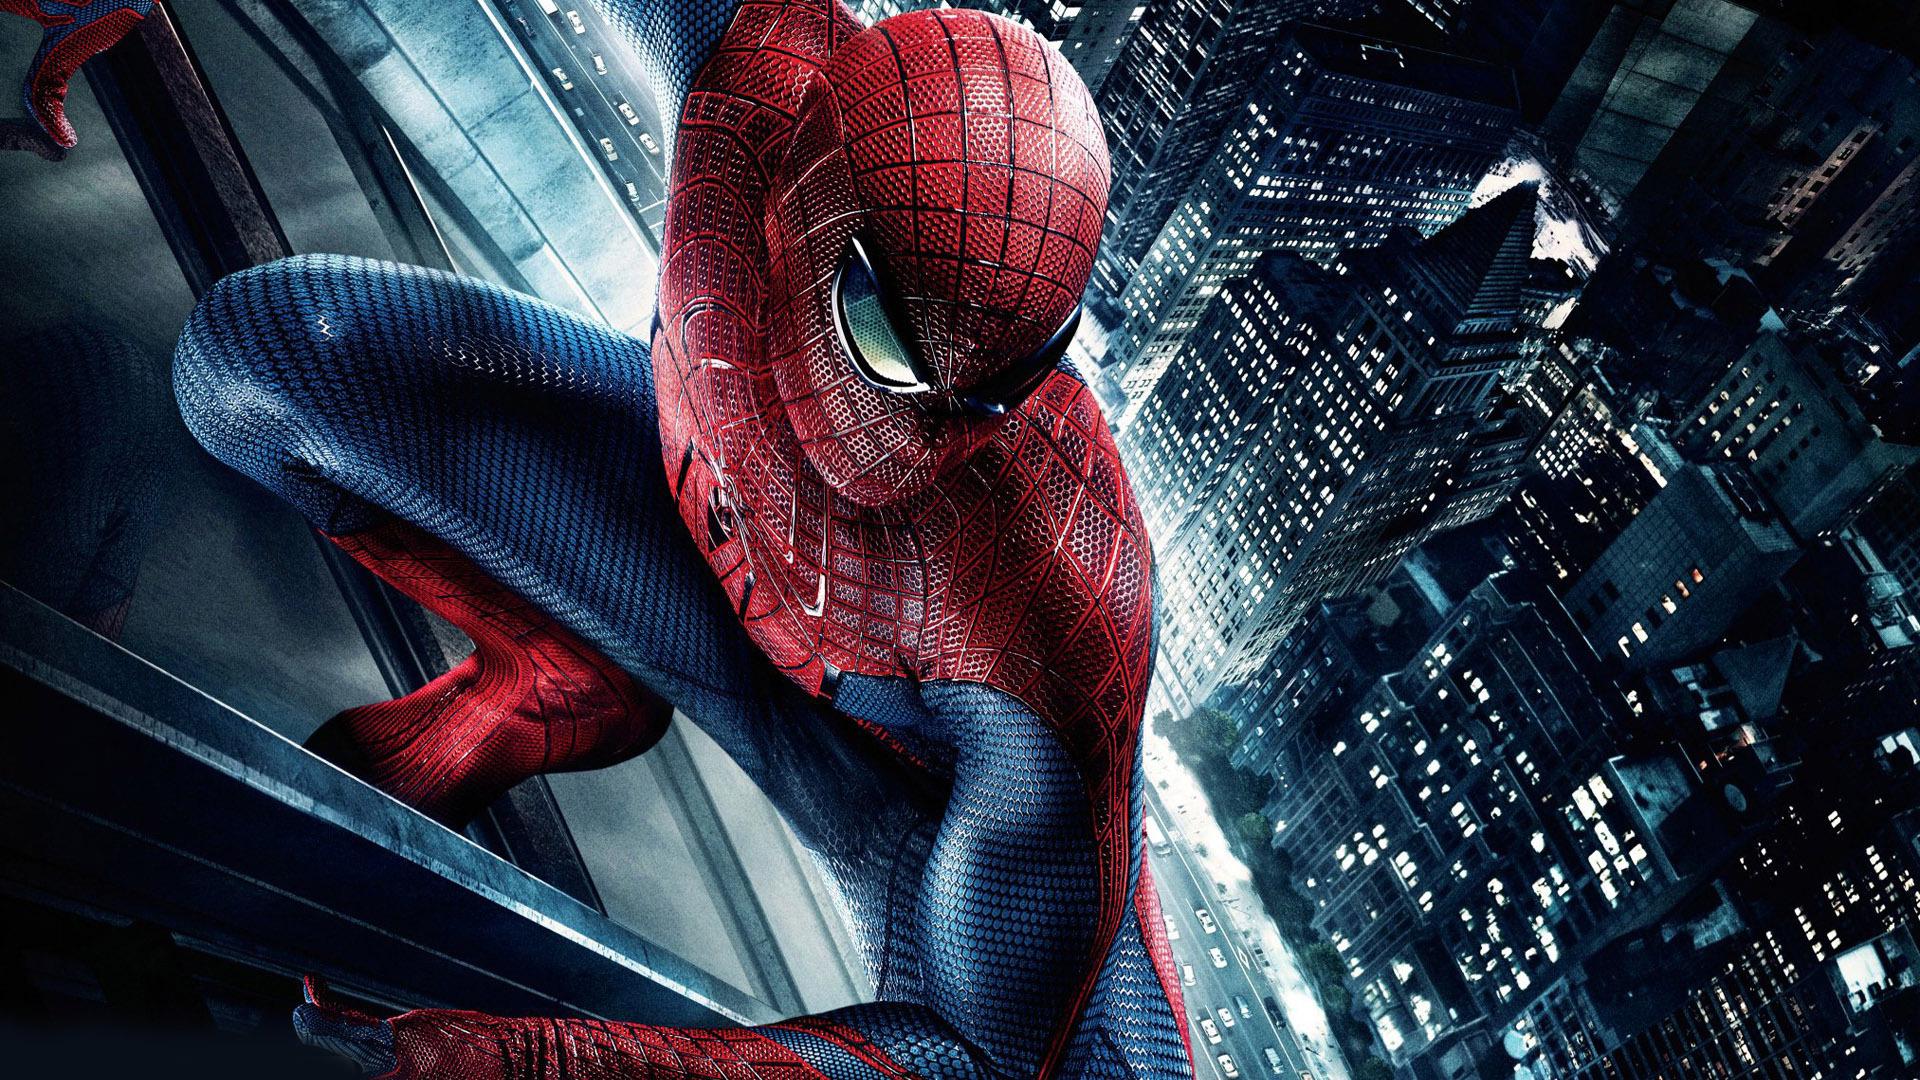 The Amazing Spider Man wallpaper 11375 1920x1080